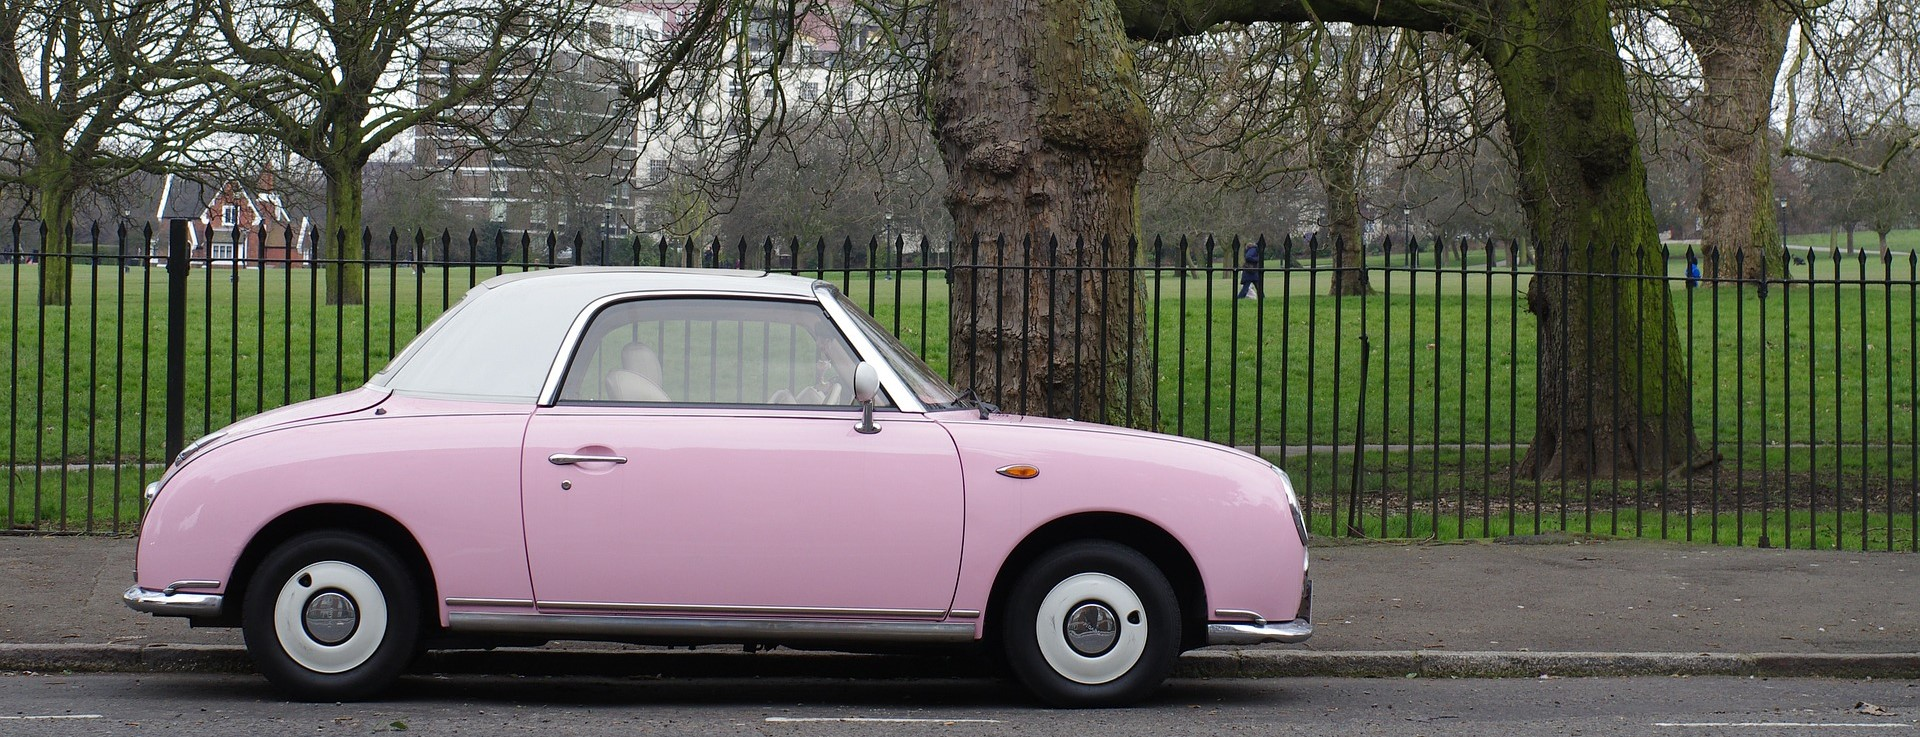 Pink Car in Sylmar, California   Breast Cancer Car Donations